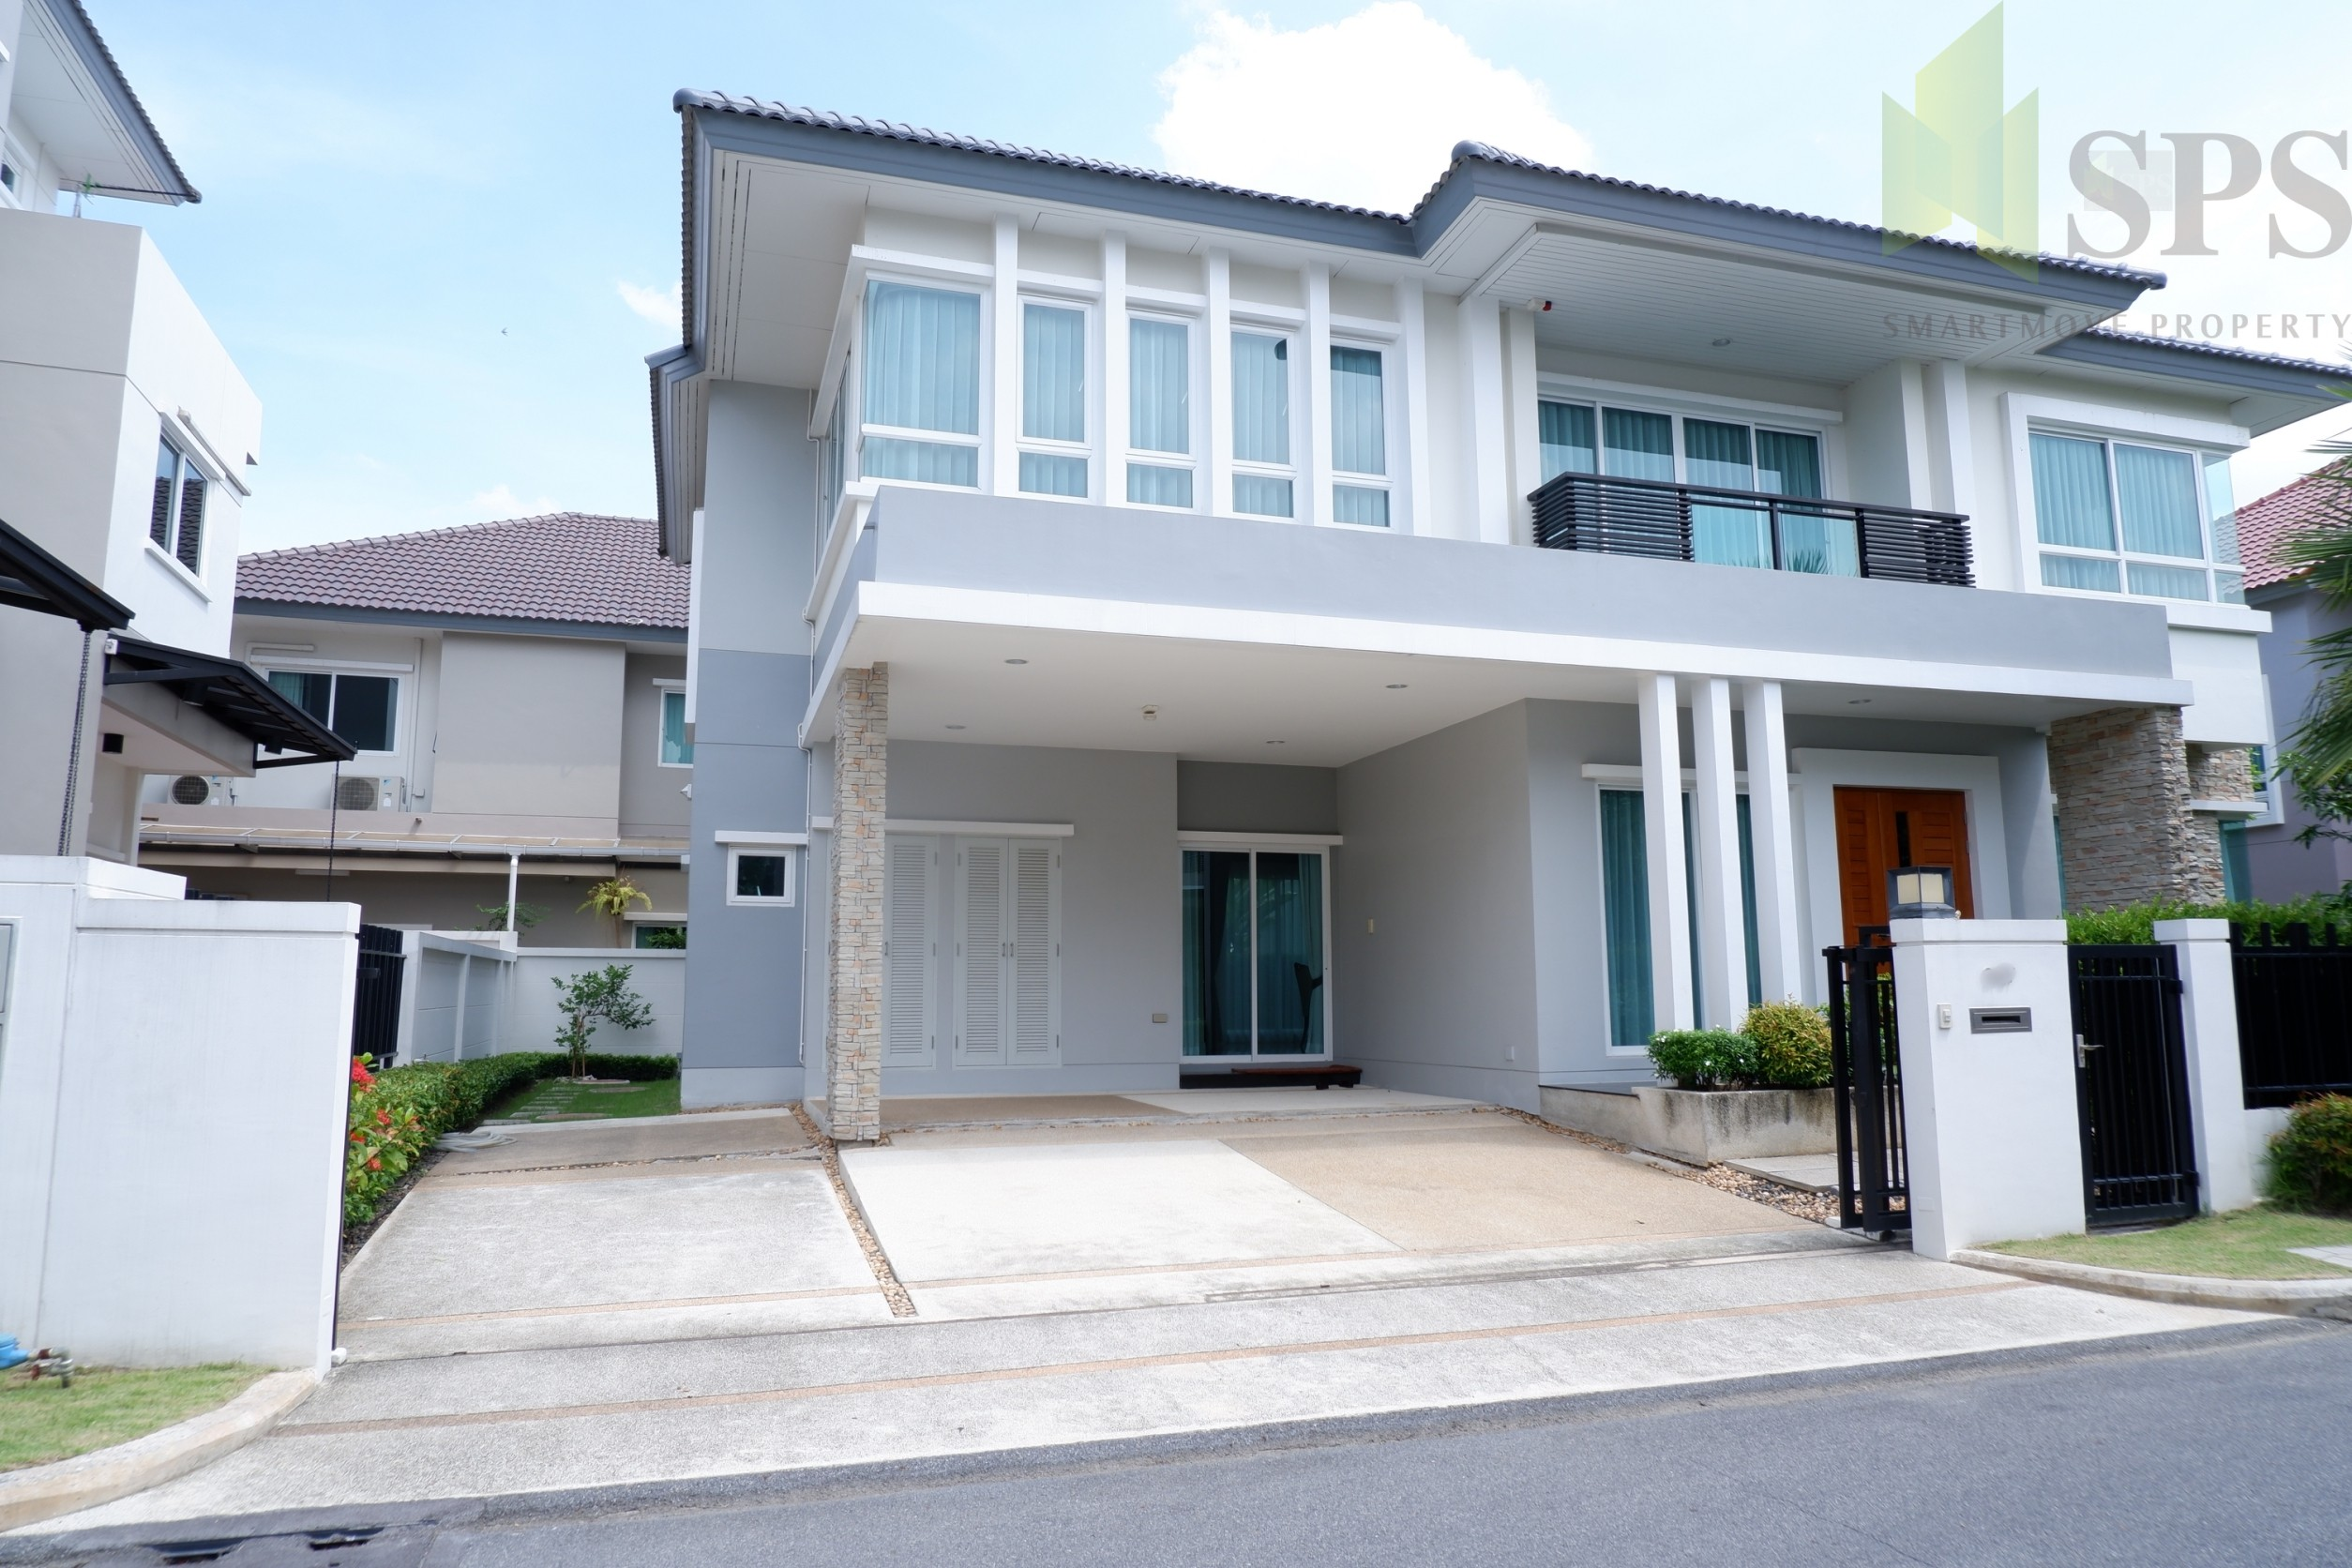 For Rent Single House Grand Bangkok Boulevard Rama 9 – Srinakarin (SPS-GH87)